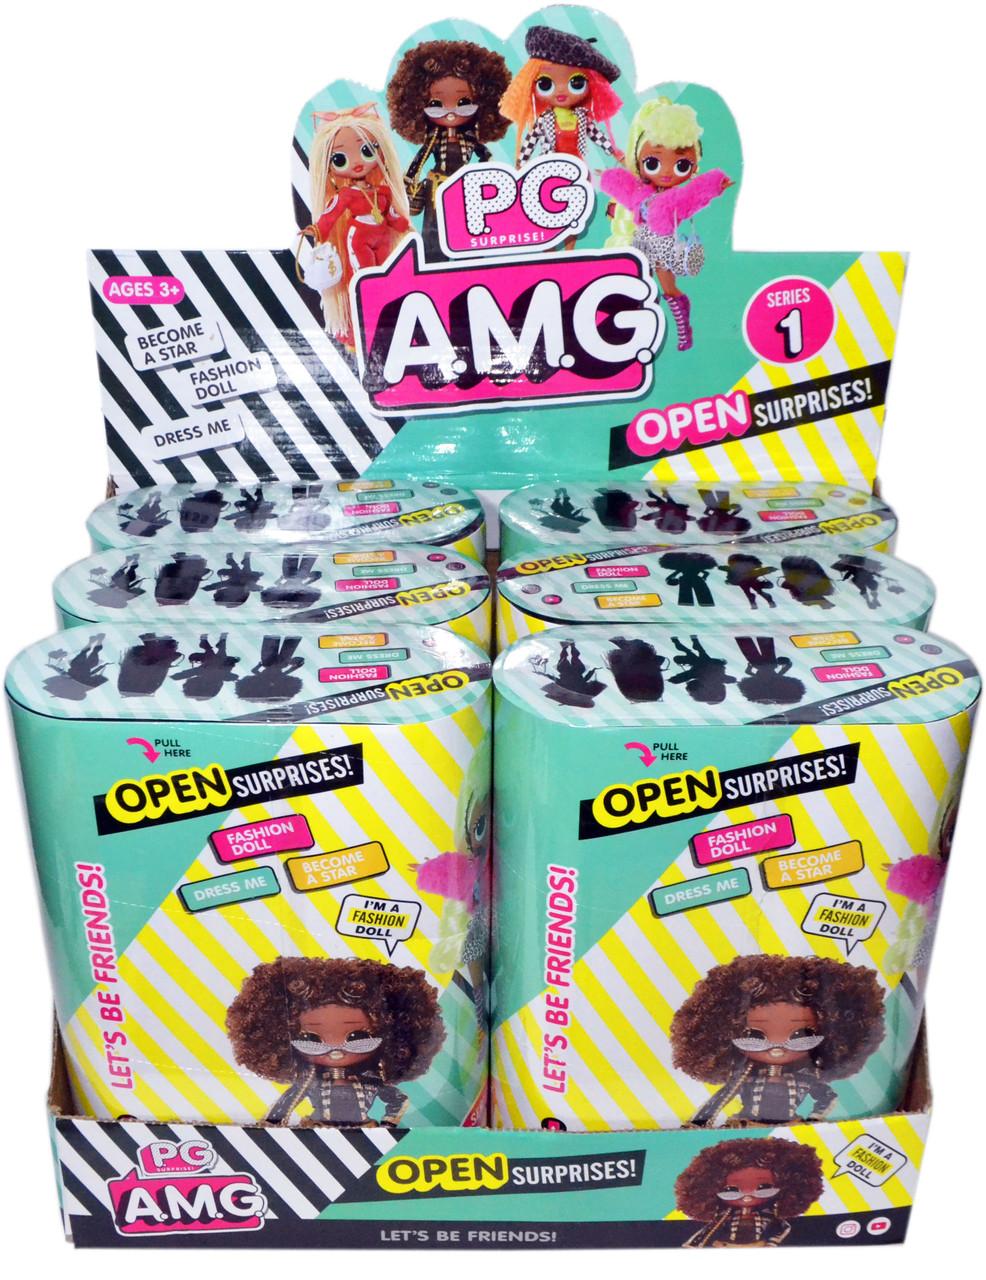 Pg 8023 Сюрприз A.M.G Модница кукла лол в капсуле 6шт, цена за 1шт 25*17см